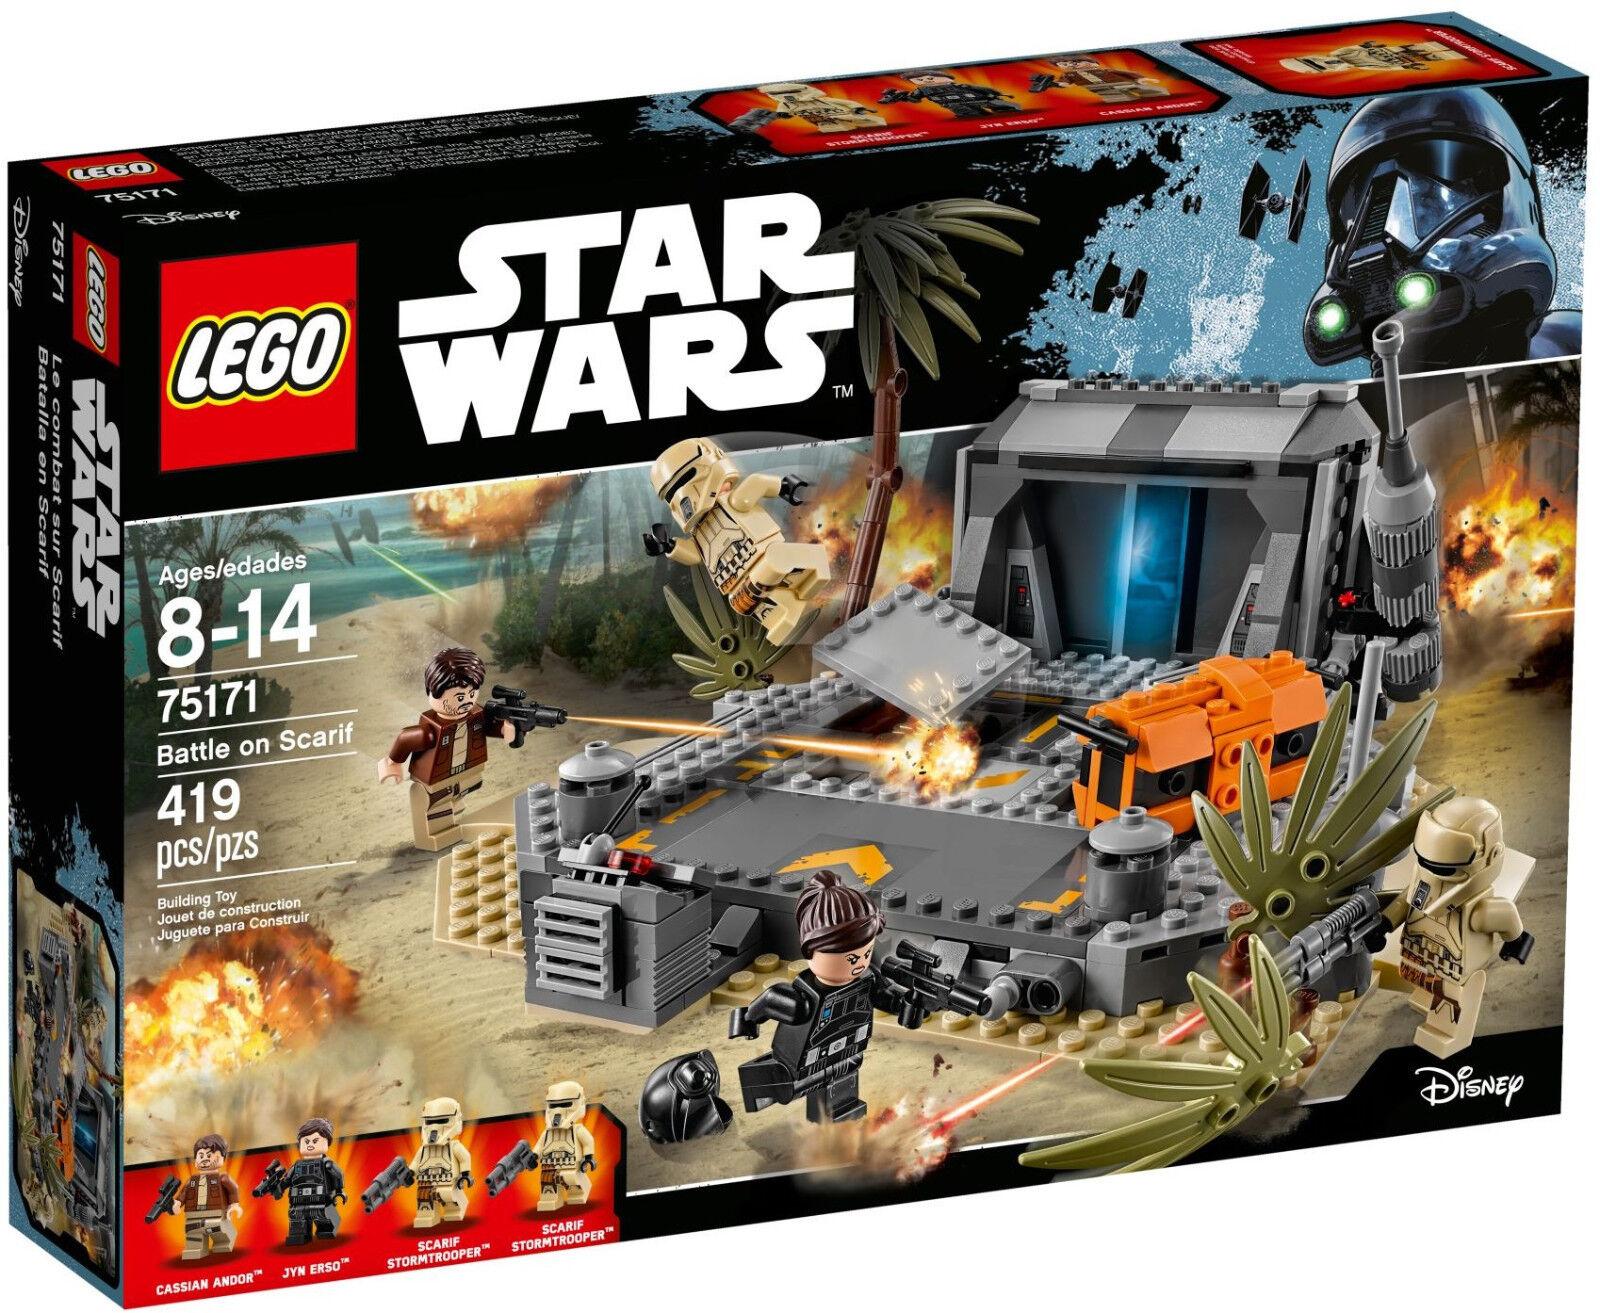 LEGO Star Wars - 75171 Battle on Scarif mit Jyn Erso und Cassian - Neu